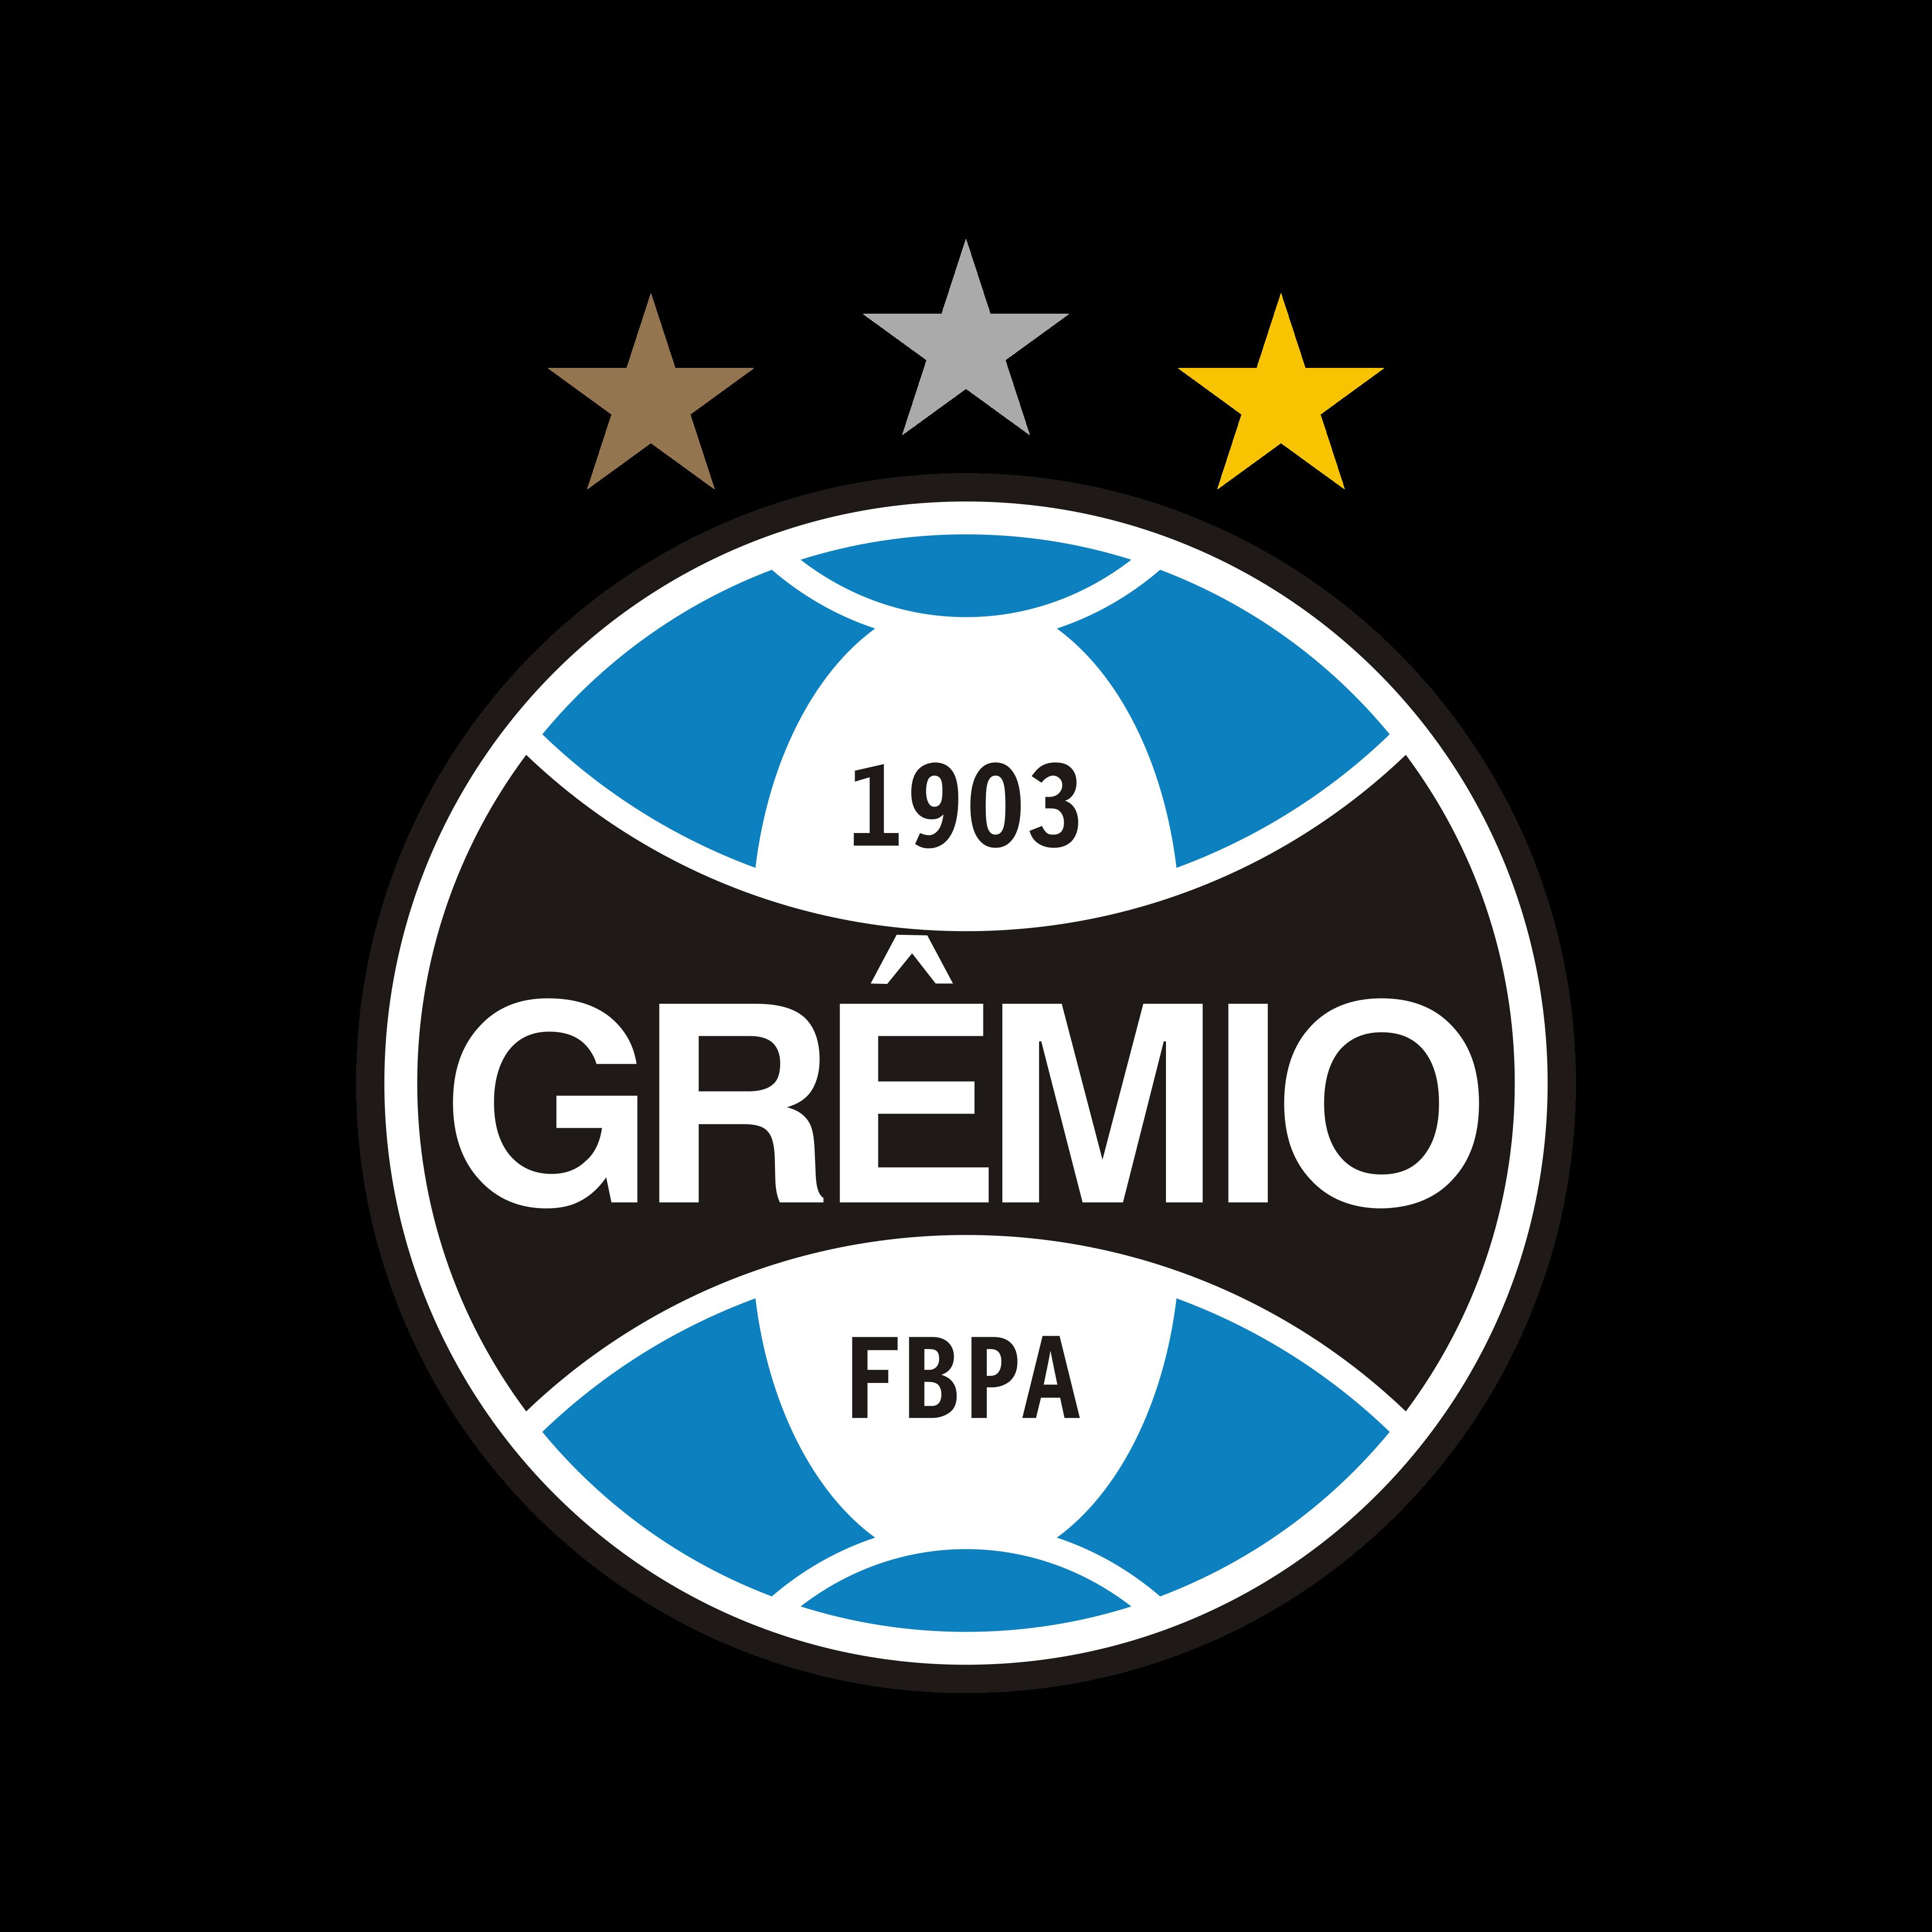 gremio logo 0 - Grêmio Logo - Grêmio Escudo